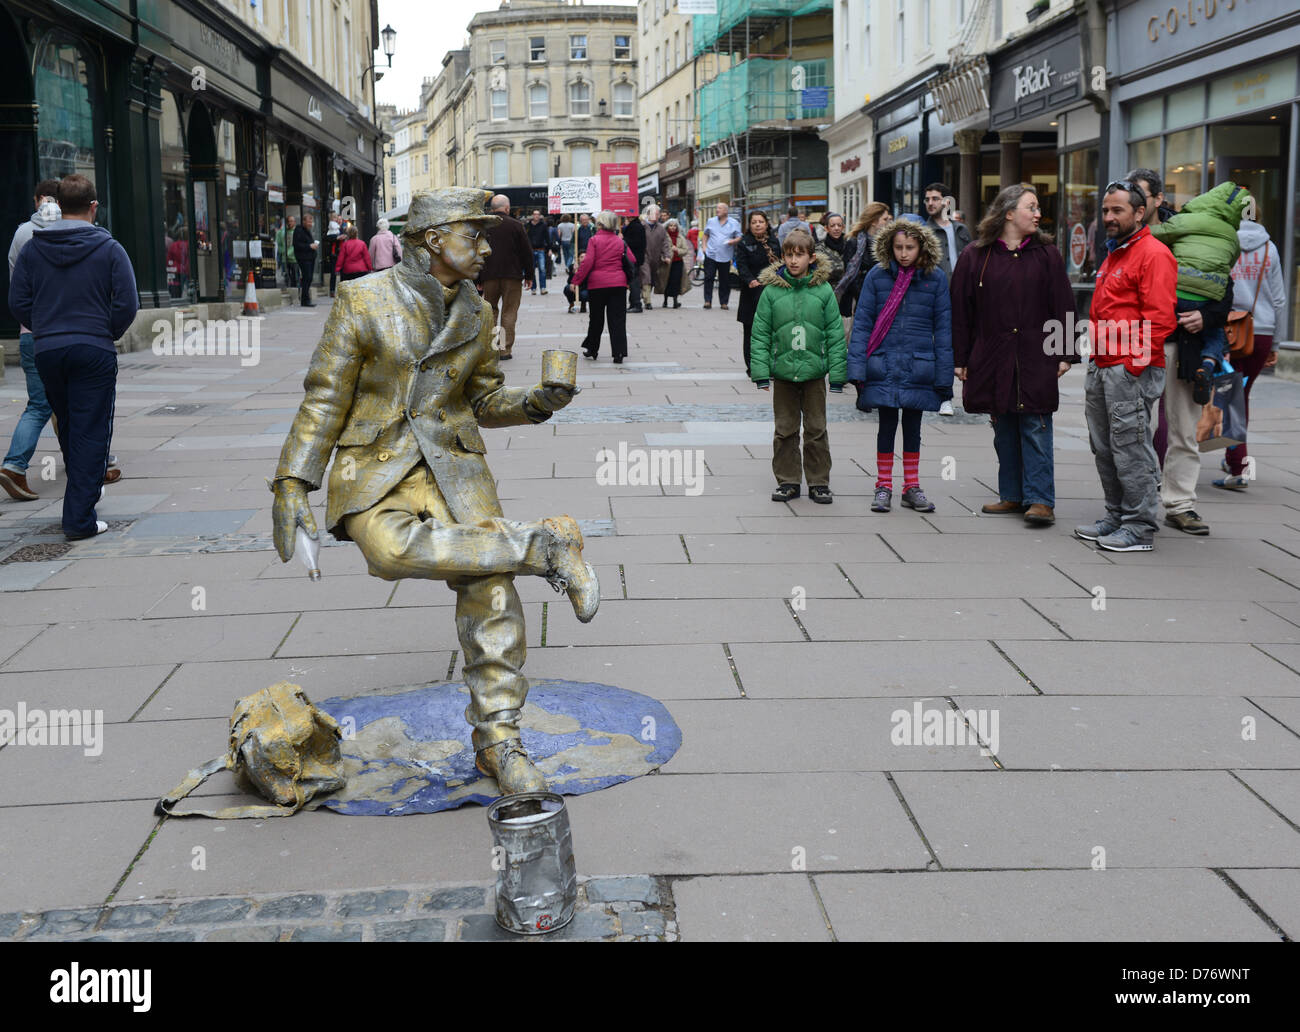 Street mime artist in Bath Uk - Stock Image